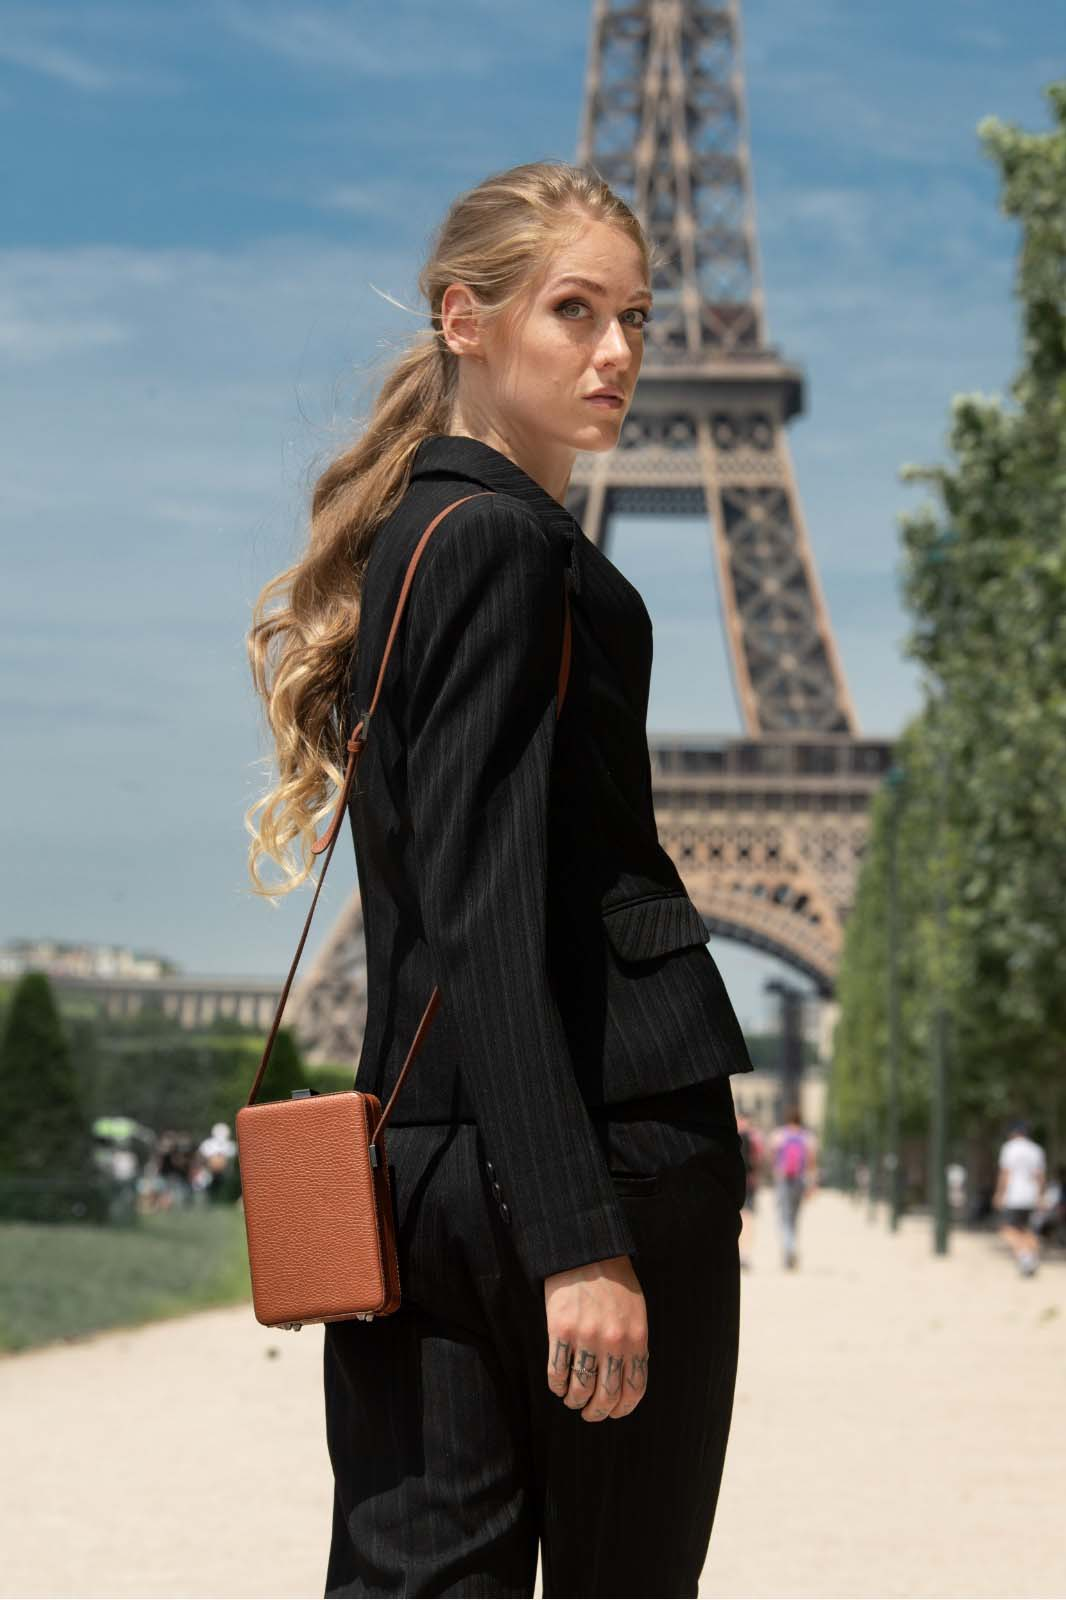 Comissioned for Frau Frieda Handbags 18